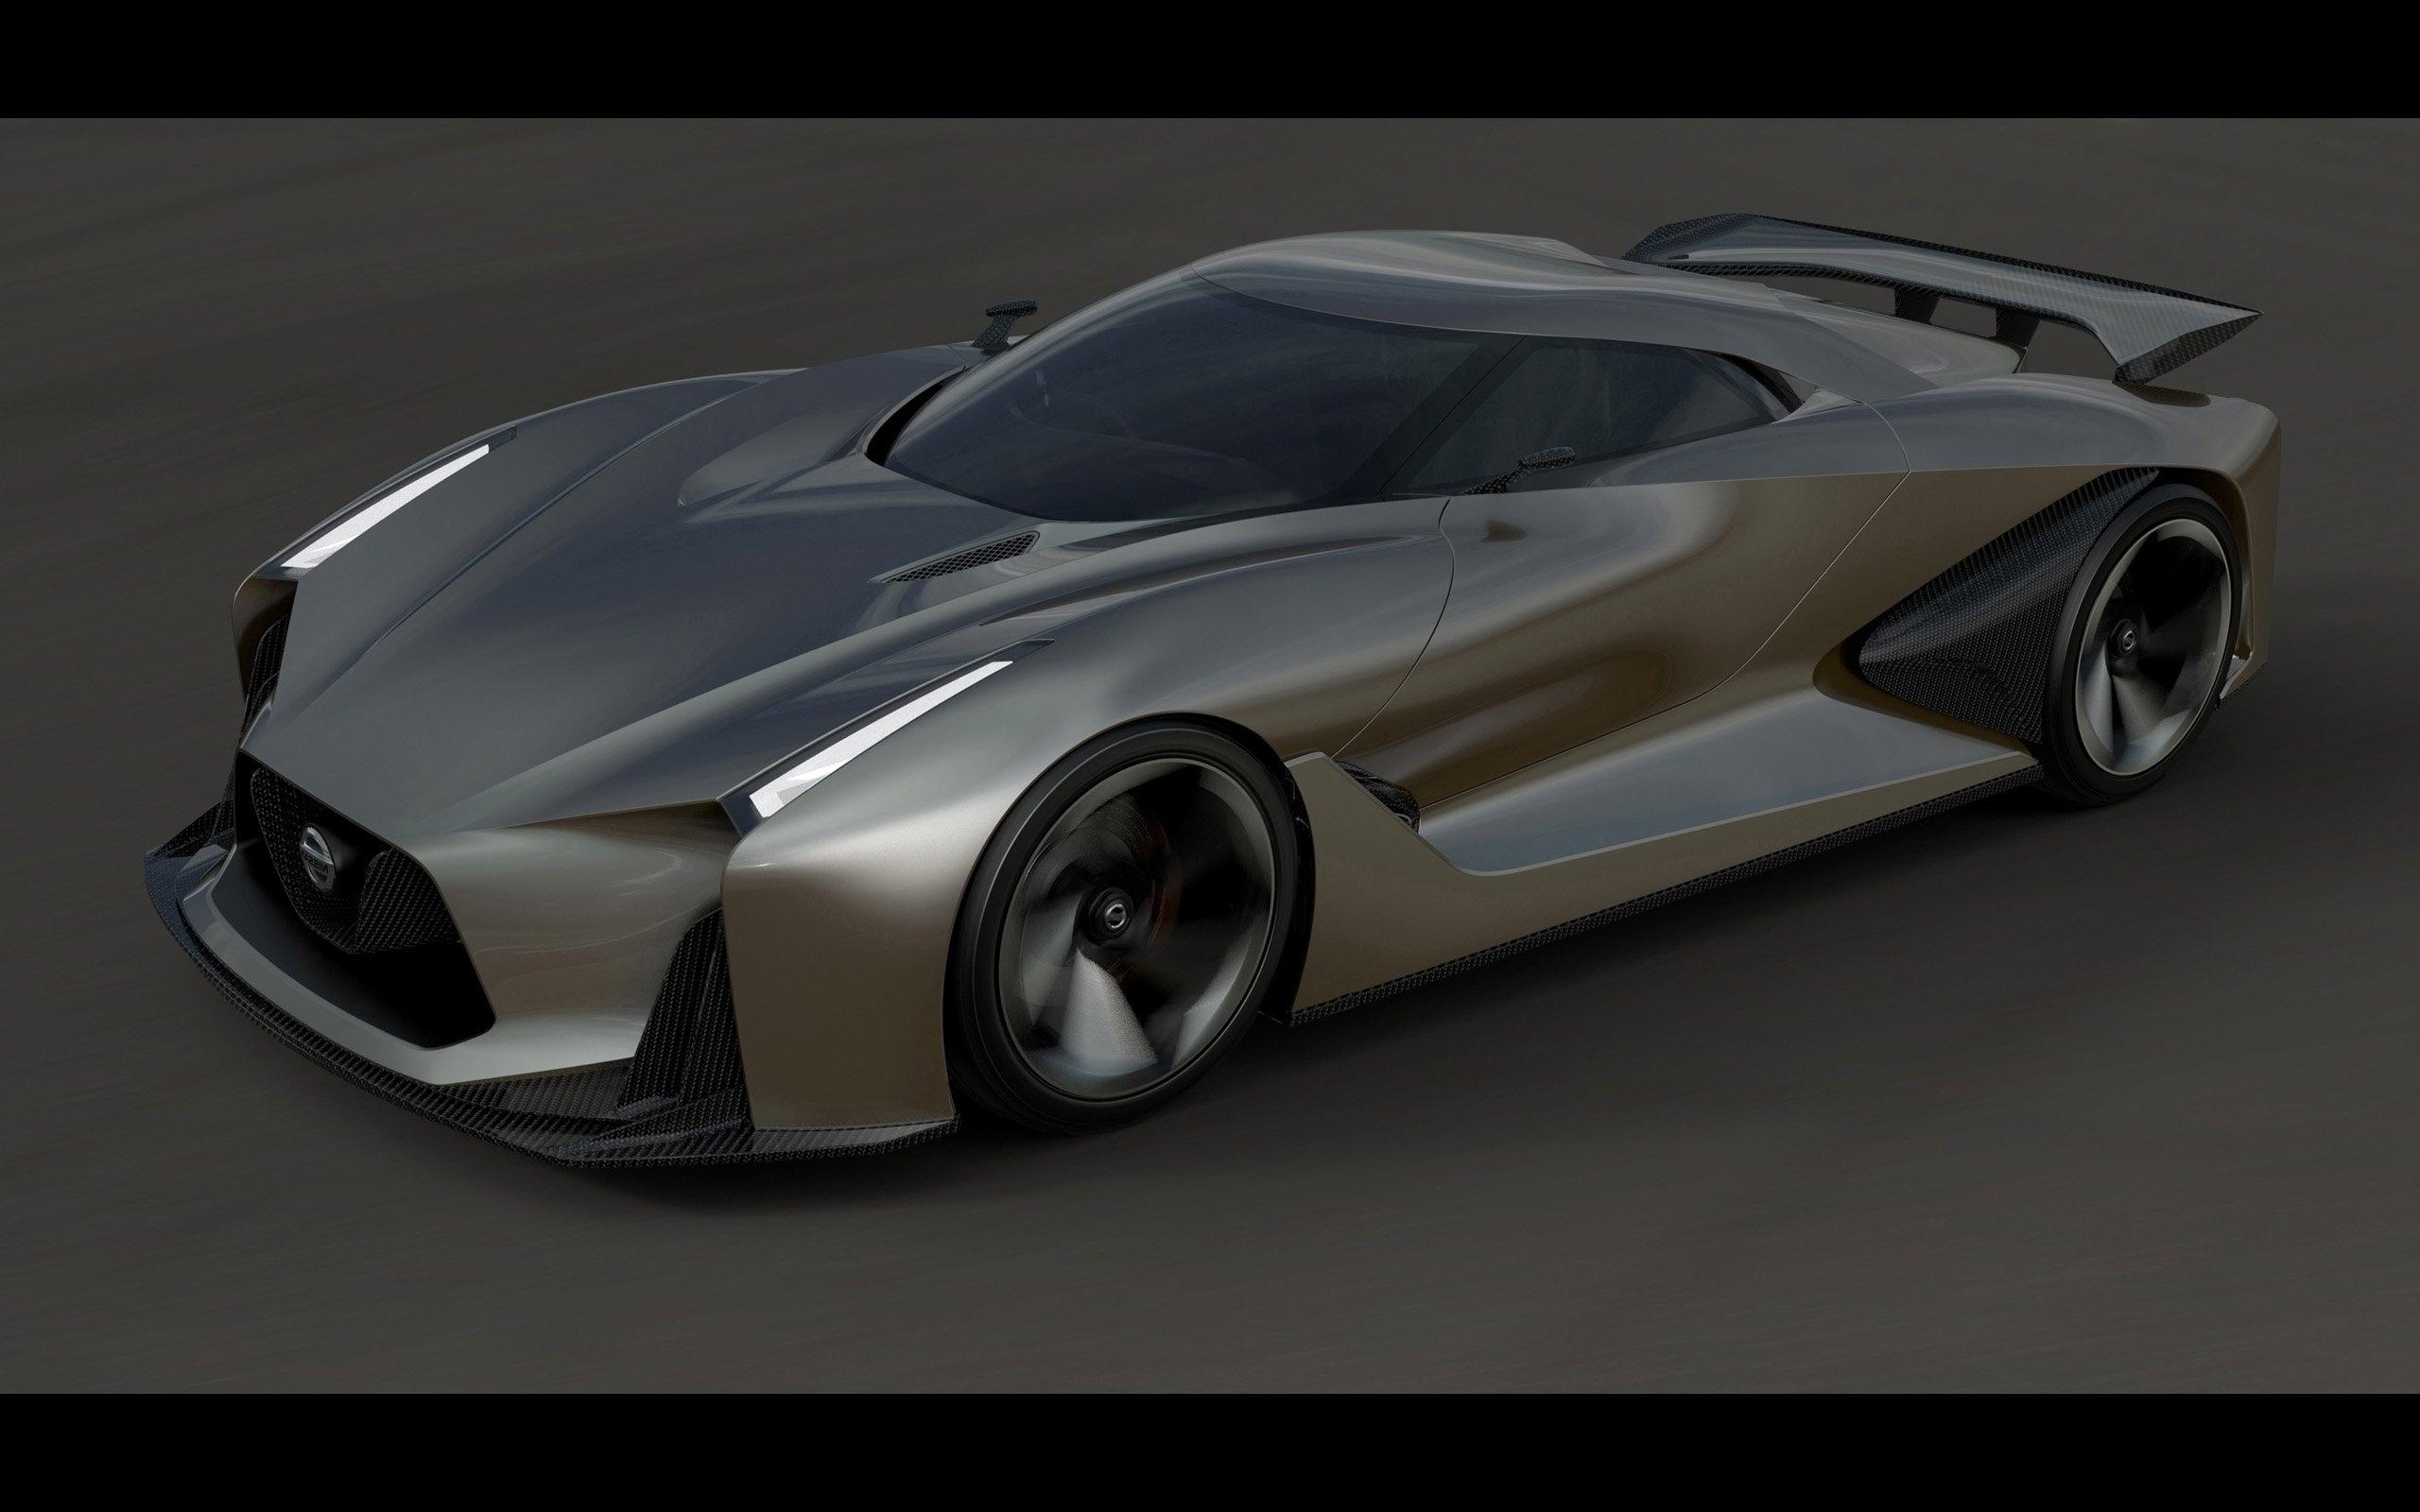 Nissan Concept Vision Gran Turismo Supercar D Wallpaper